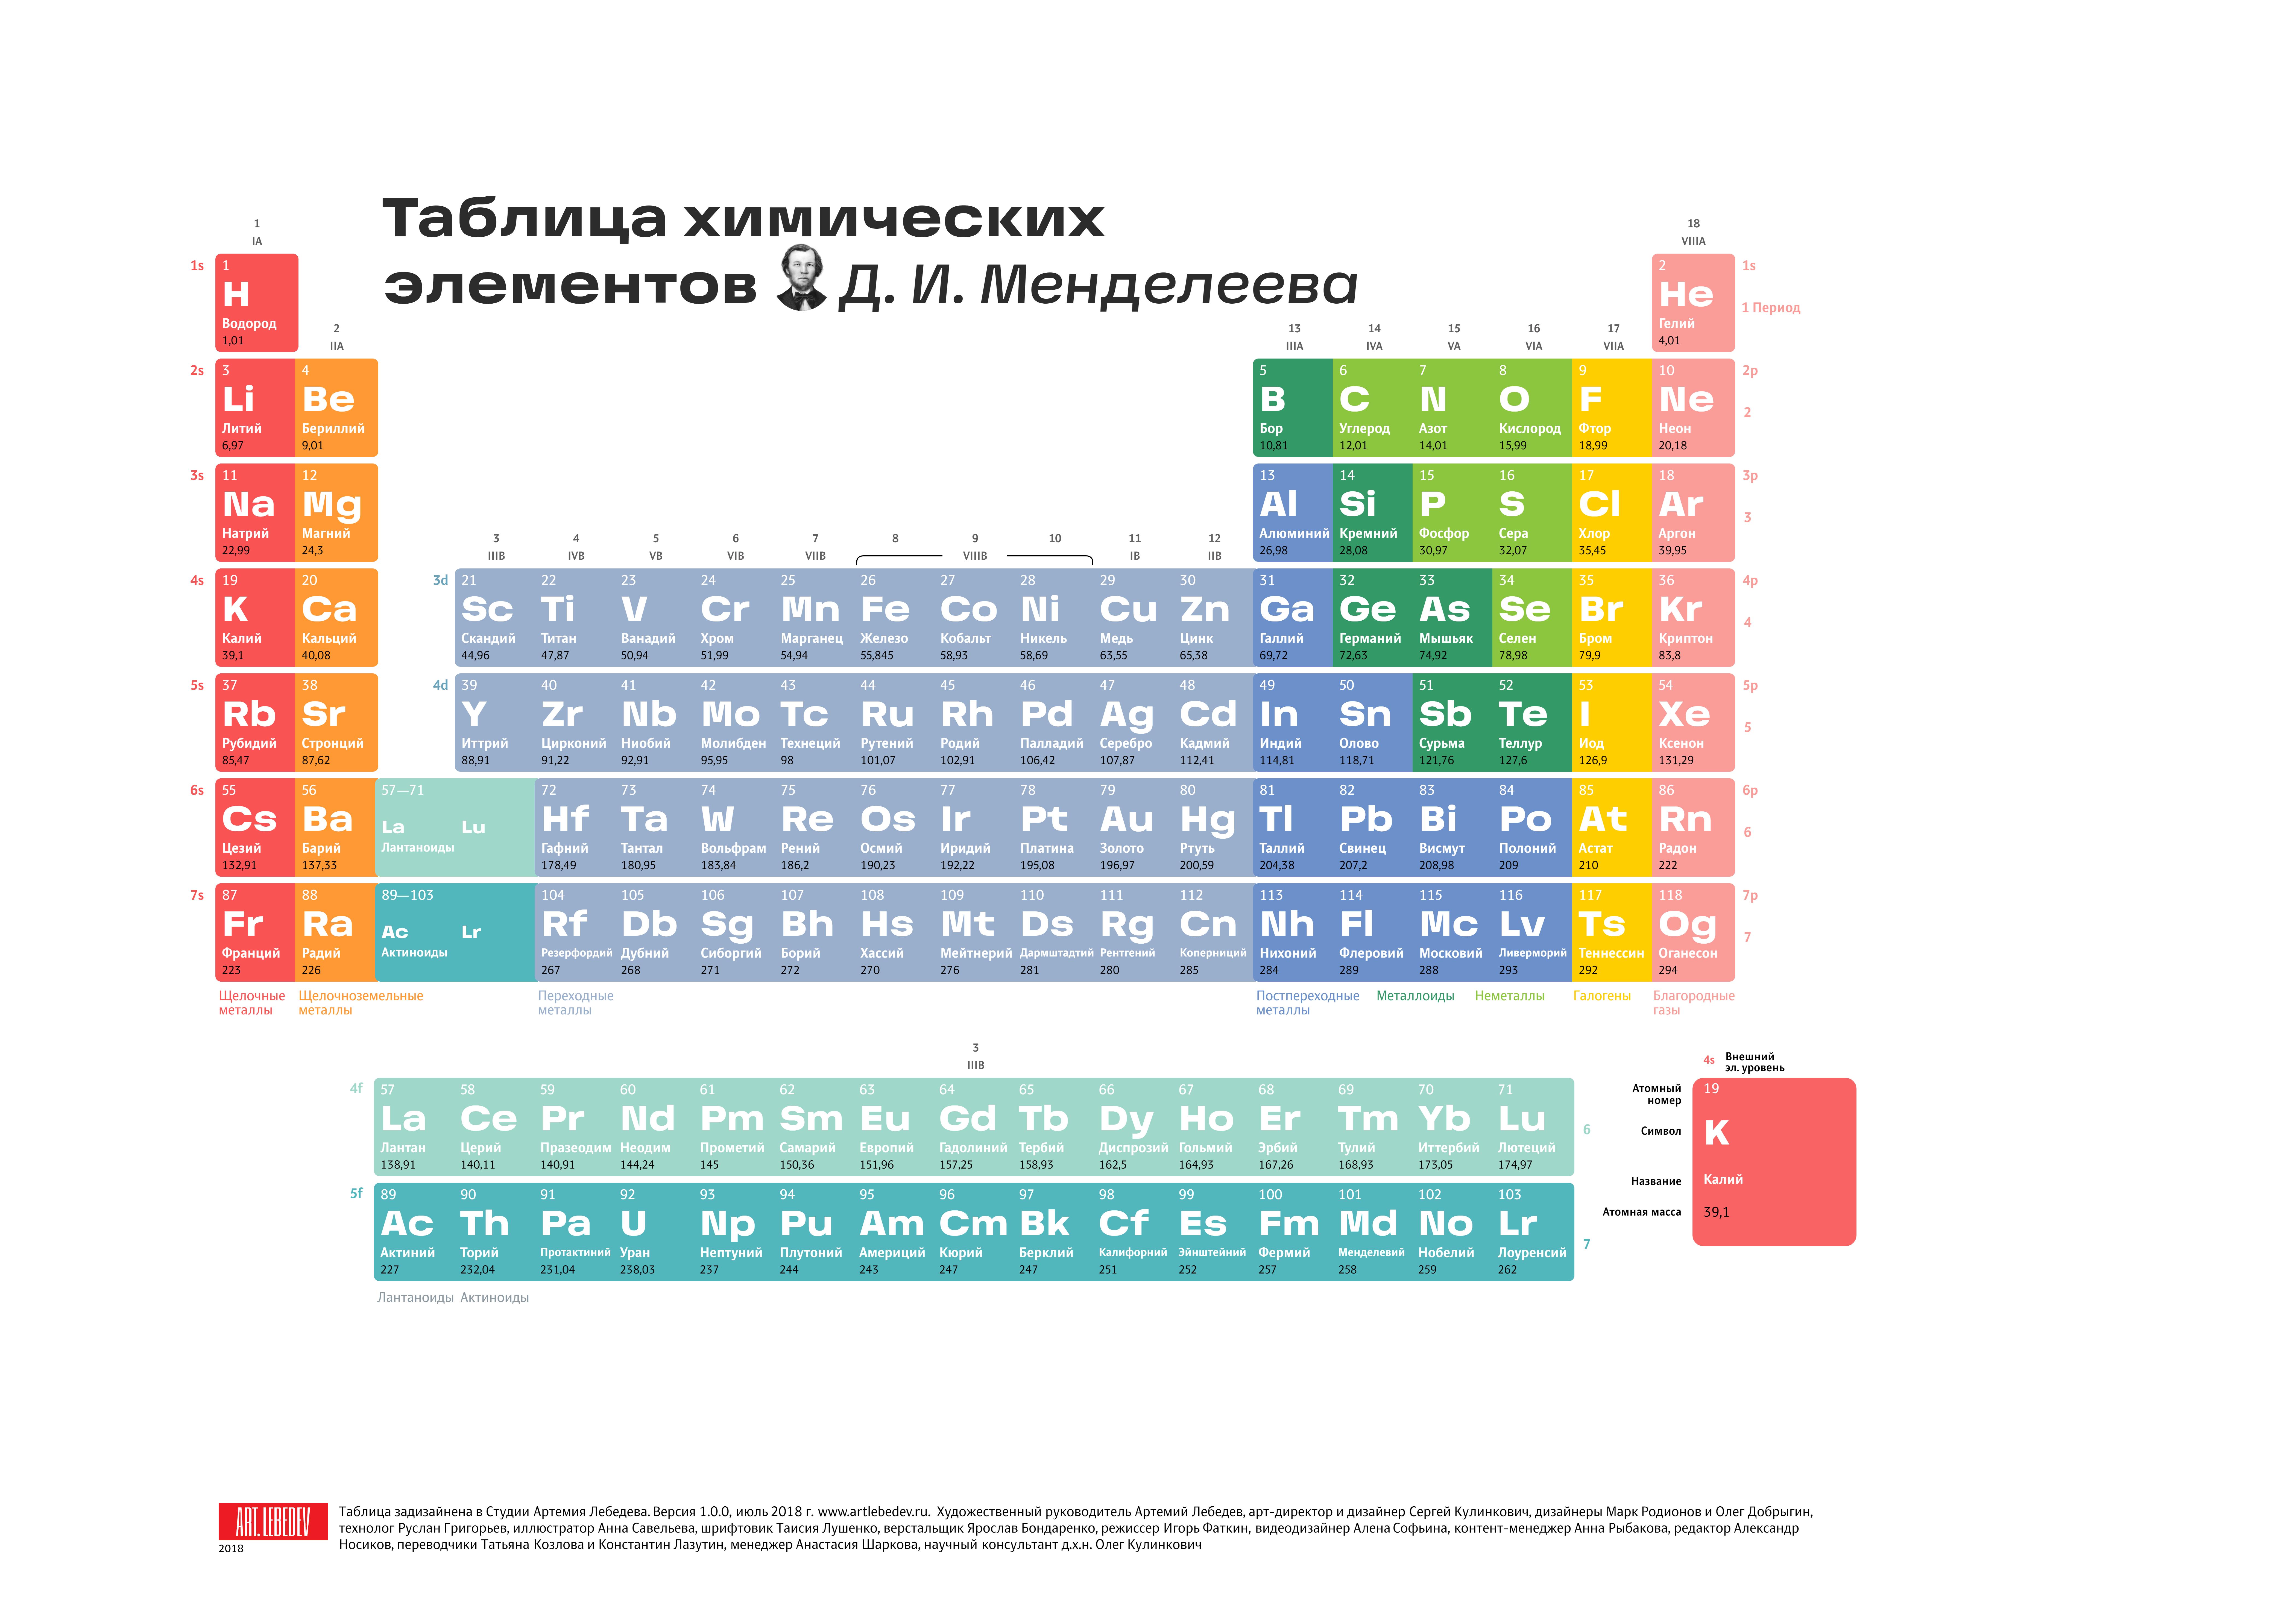 als_periodic_image_1537843193_YZzadX